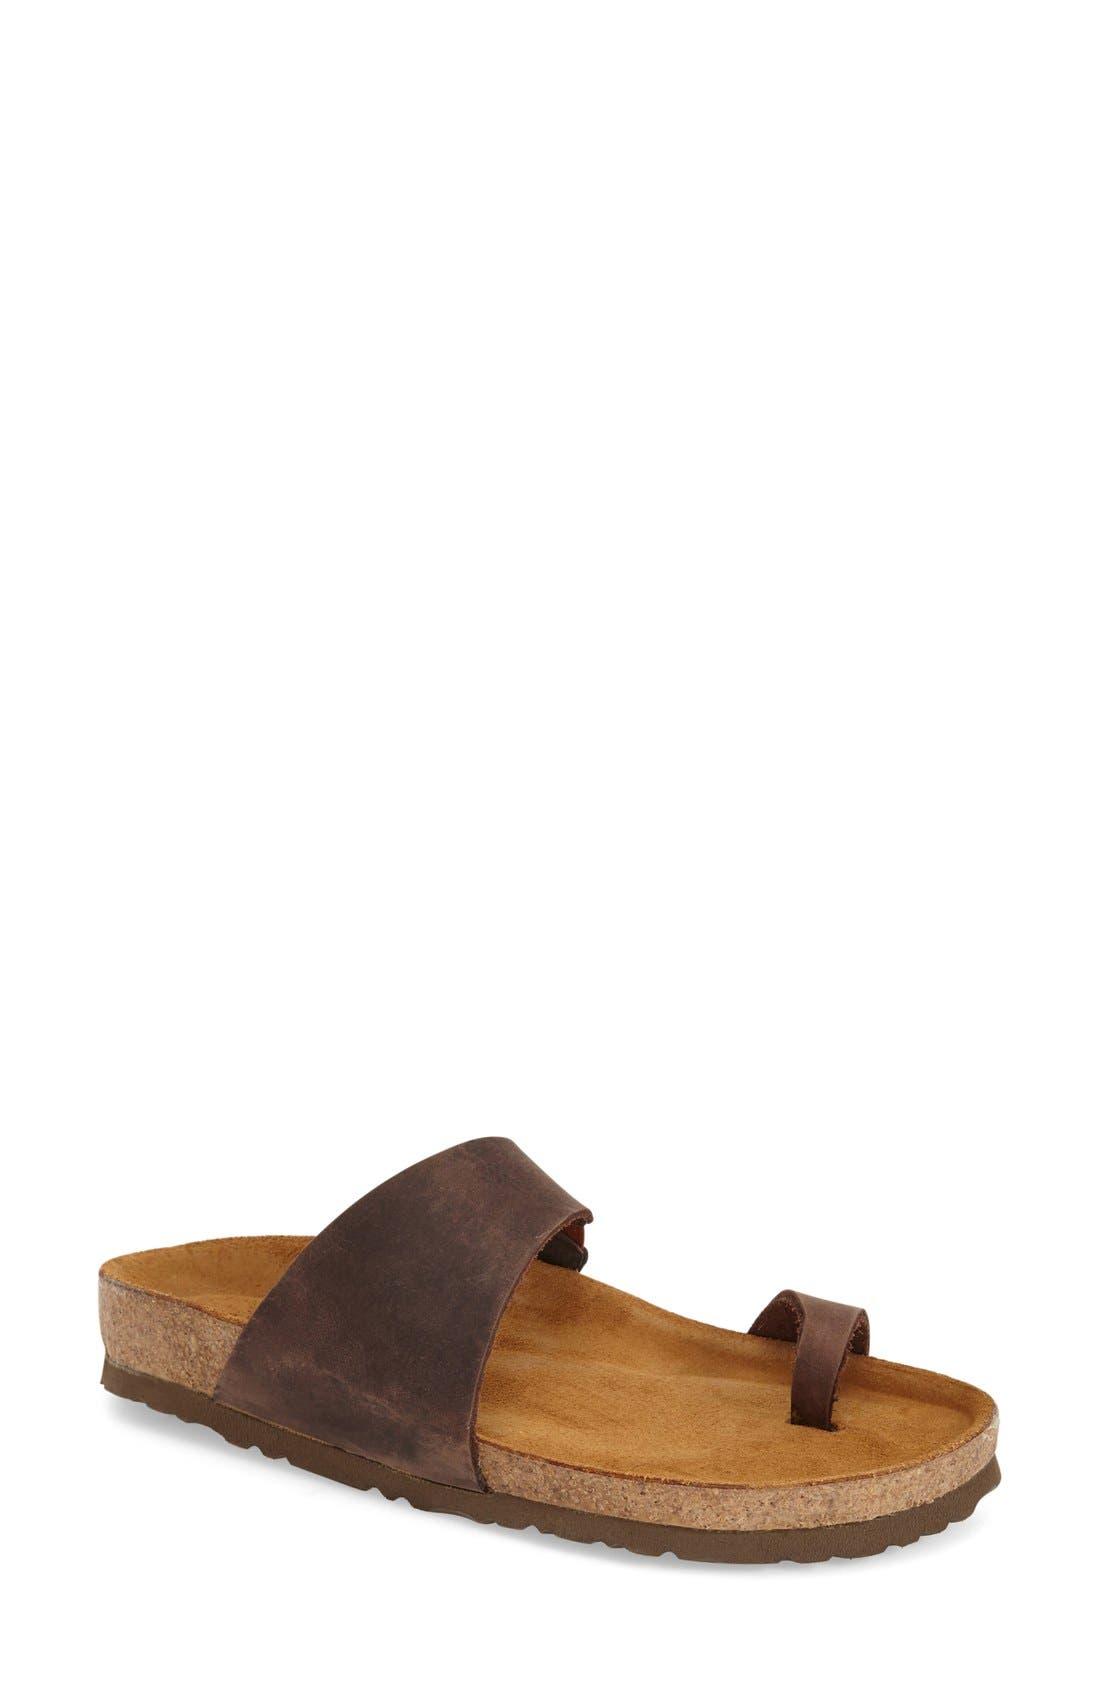 'Santa Fe' Sandal,                         Main,                         color, 200